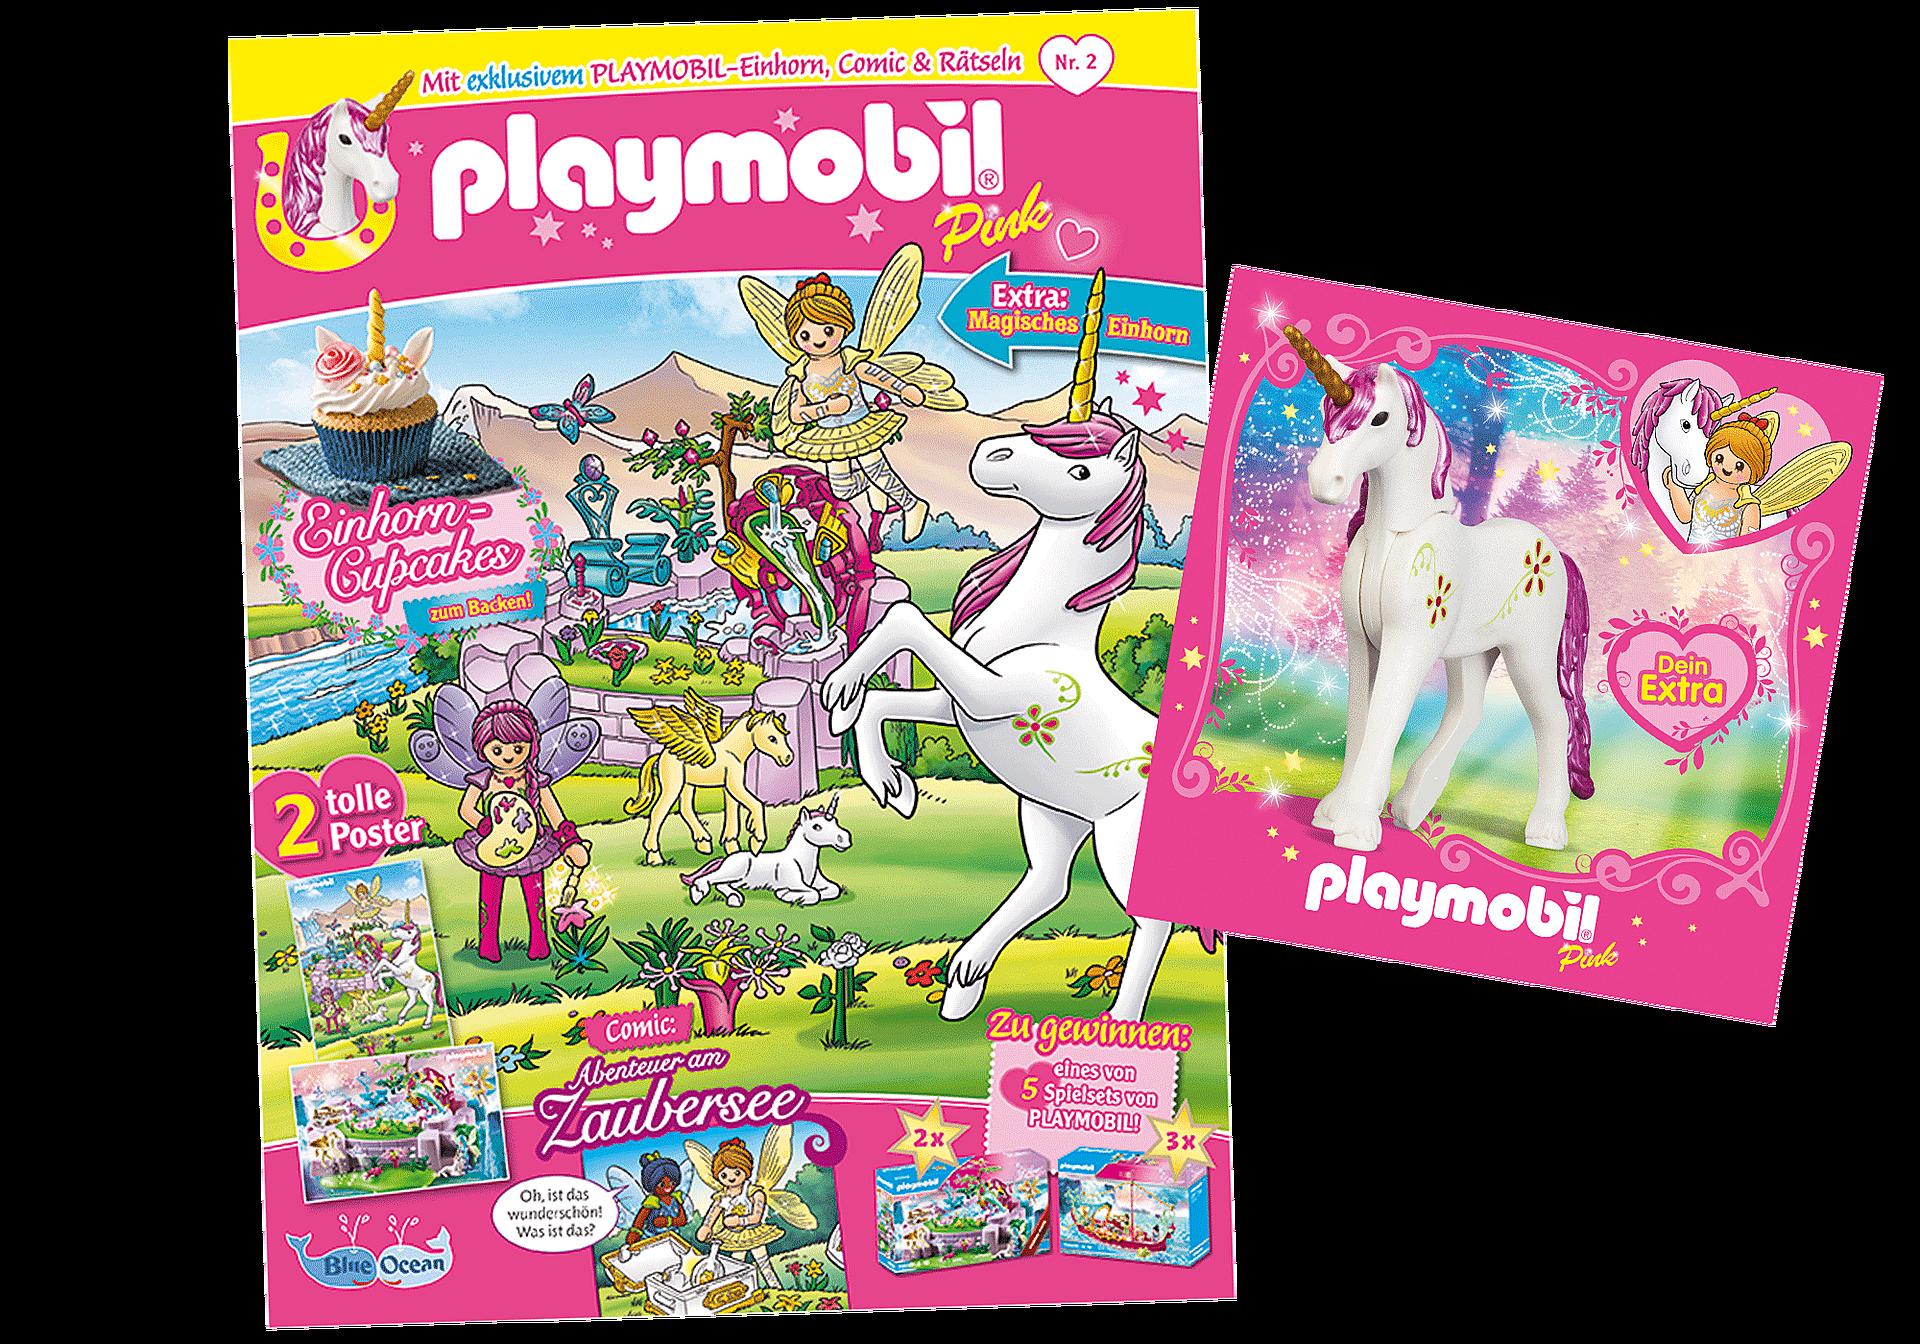 80676 PLAYMOBIL-Magazin Pink 2/2021 (Heft 60) zoom image1